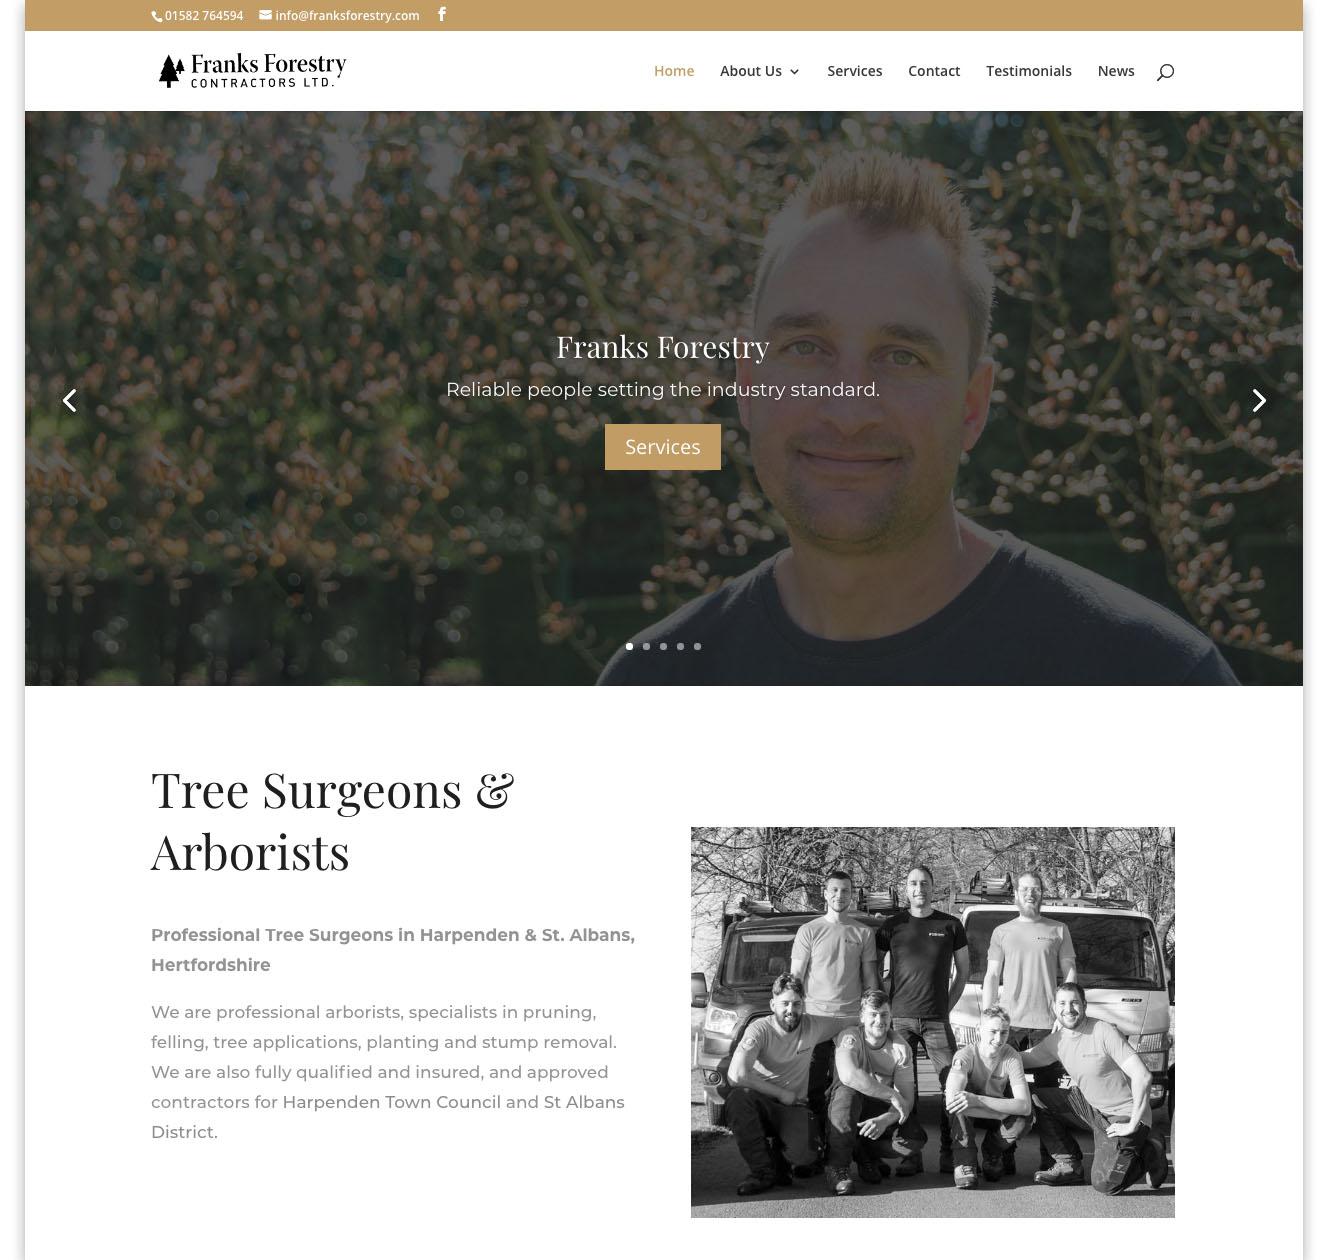 Web designers Belfast portfolio web site - franks forestry home page image 1